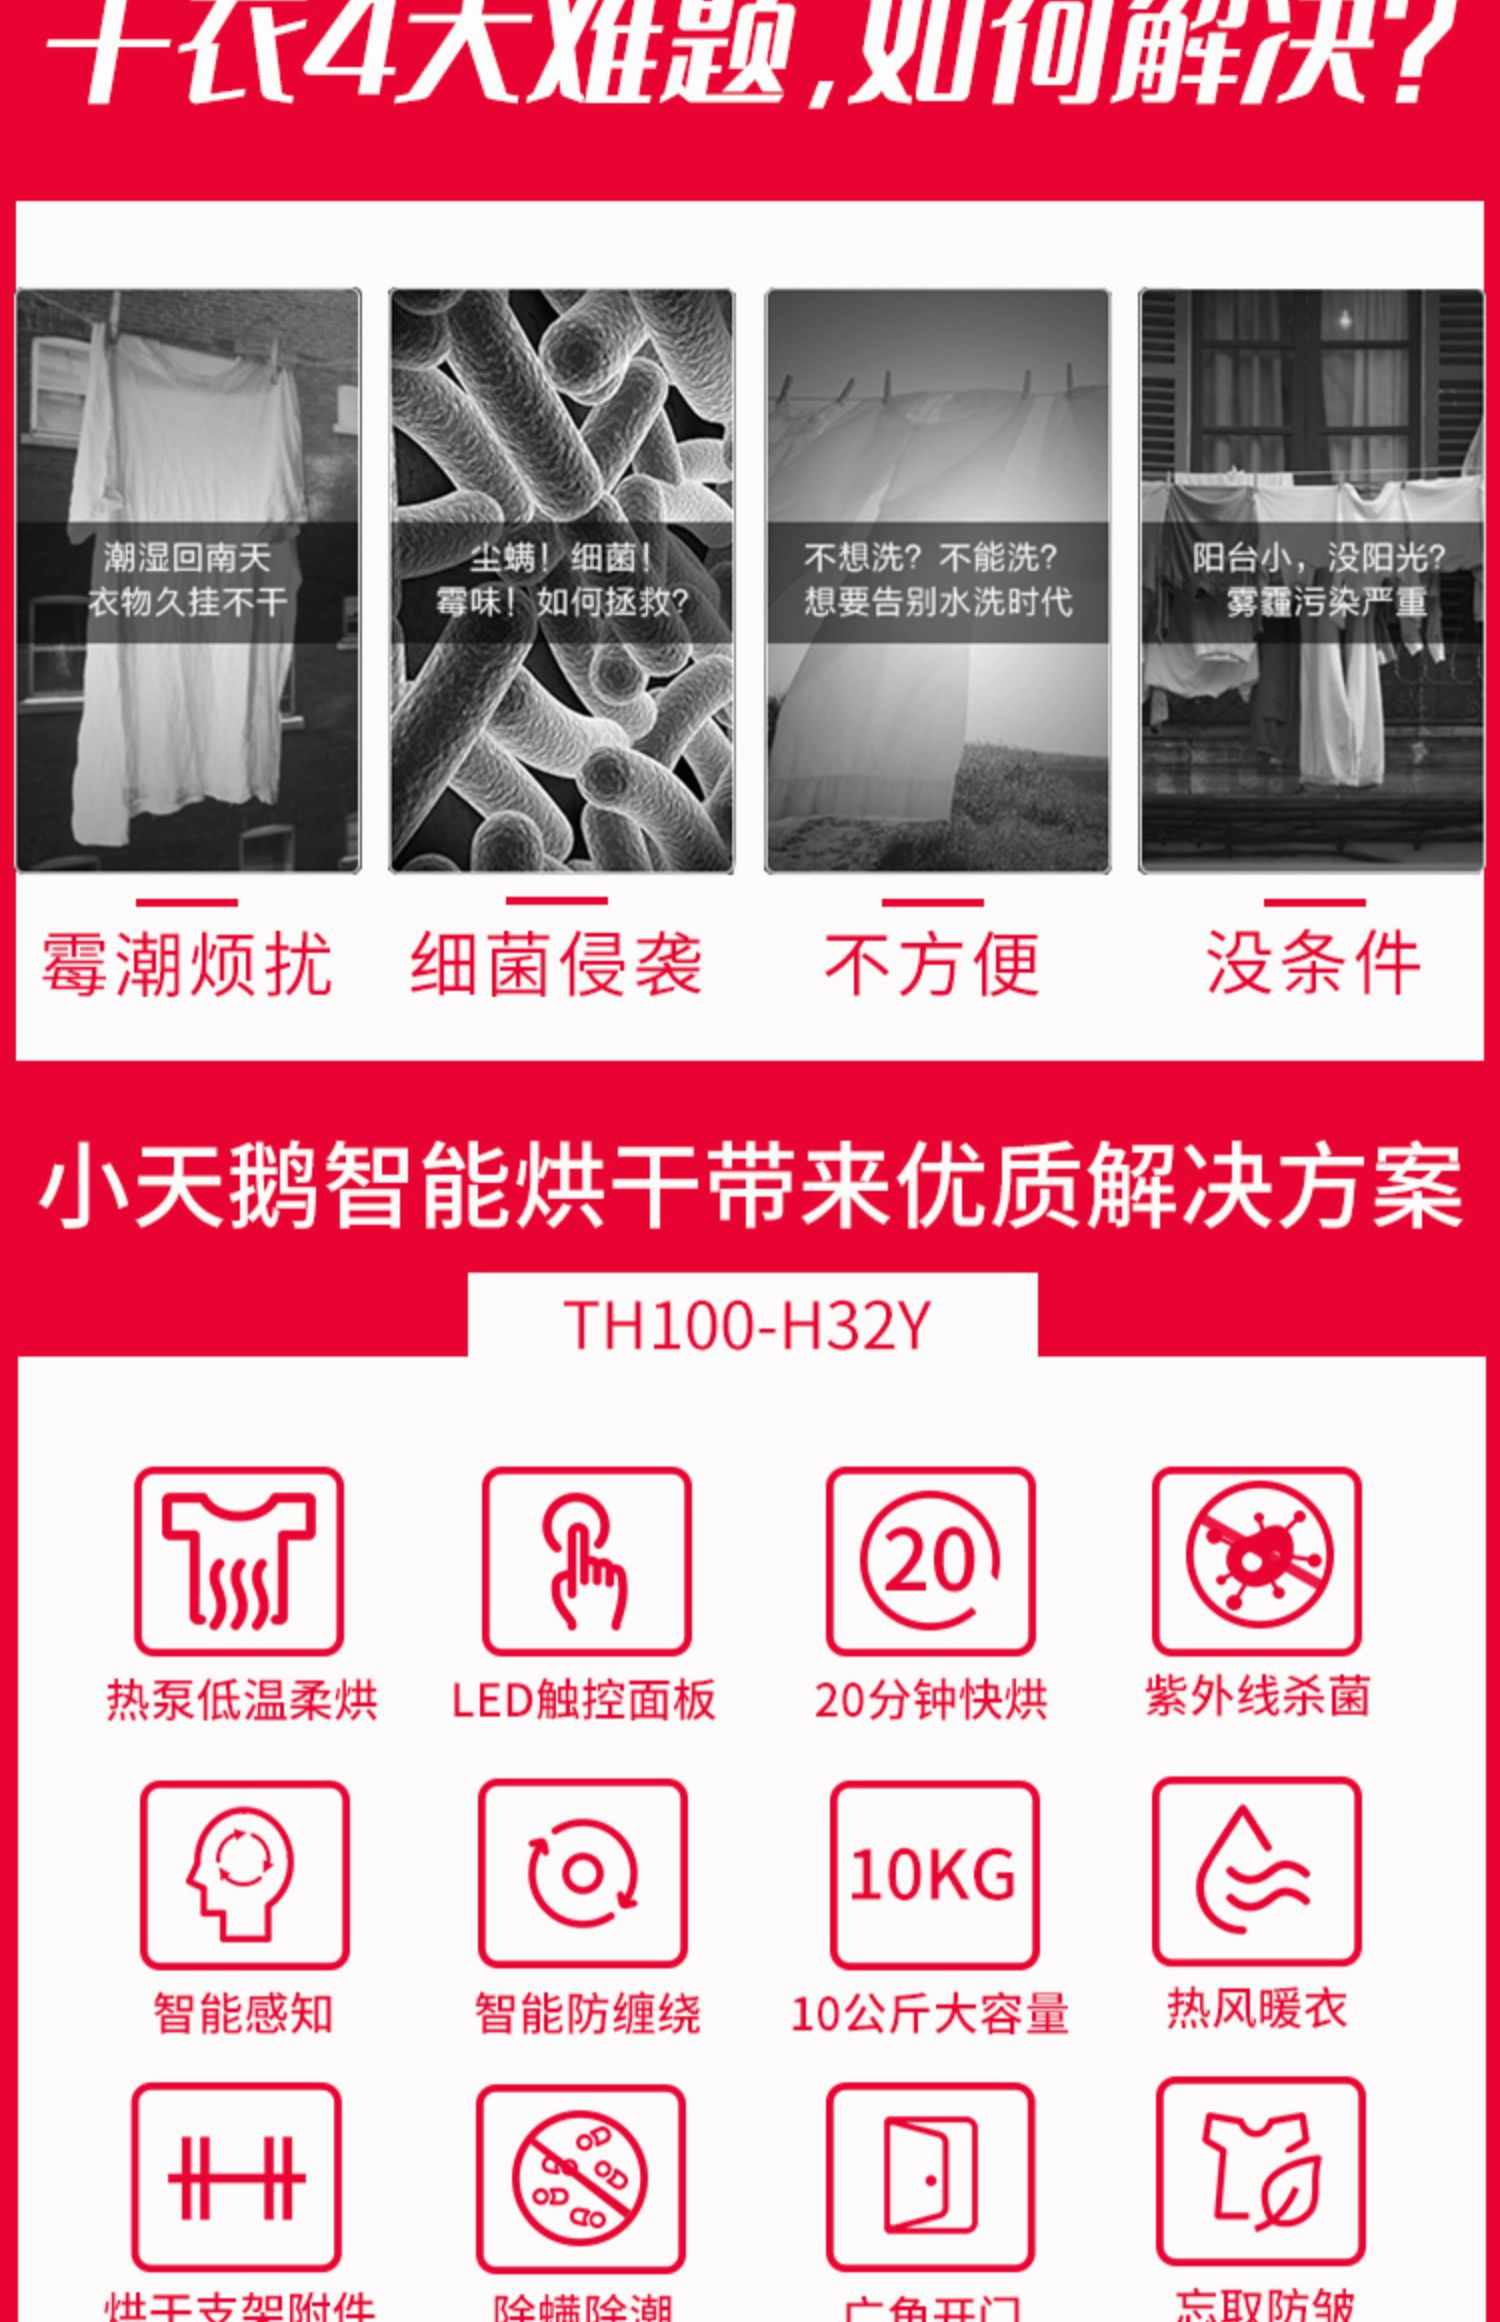 Littleswan/小天鹅 TH100-H32Y家用烘干机滚筒10公斤KG热泵干衣机商品详情图